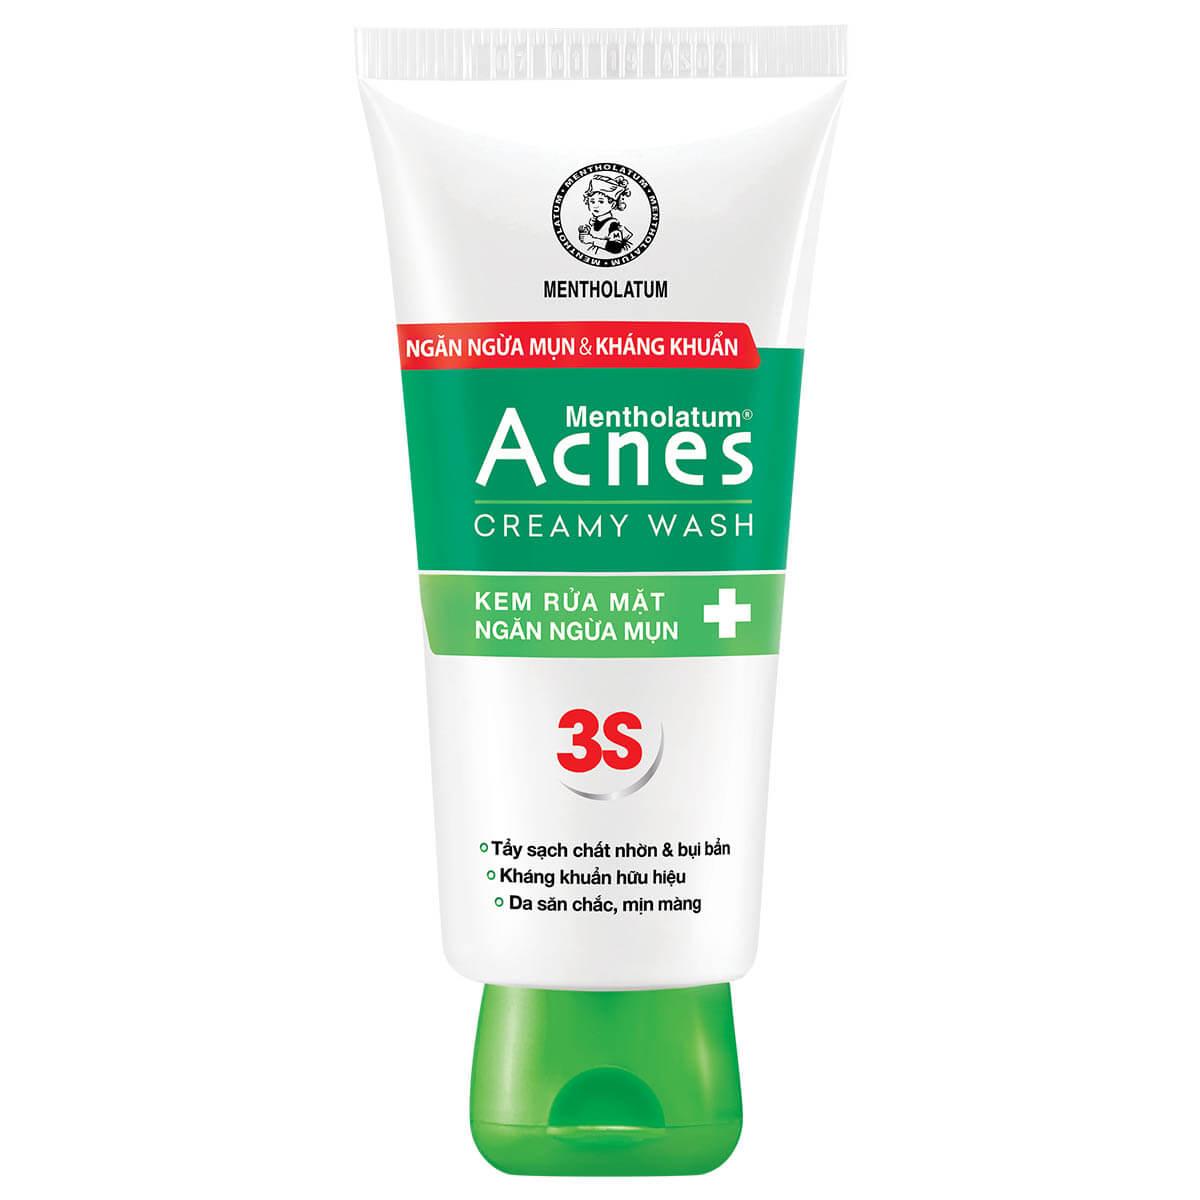 acnes creamy wash sua rua mat tri mun danh cho da kho